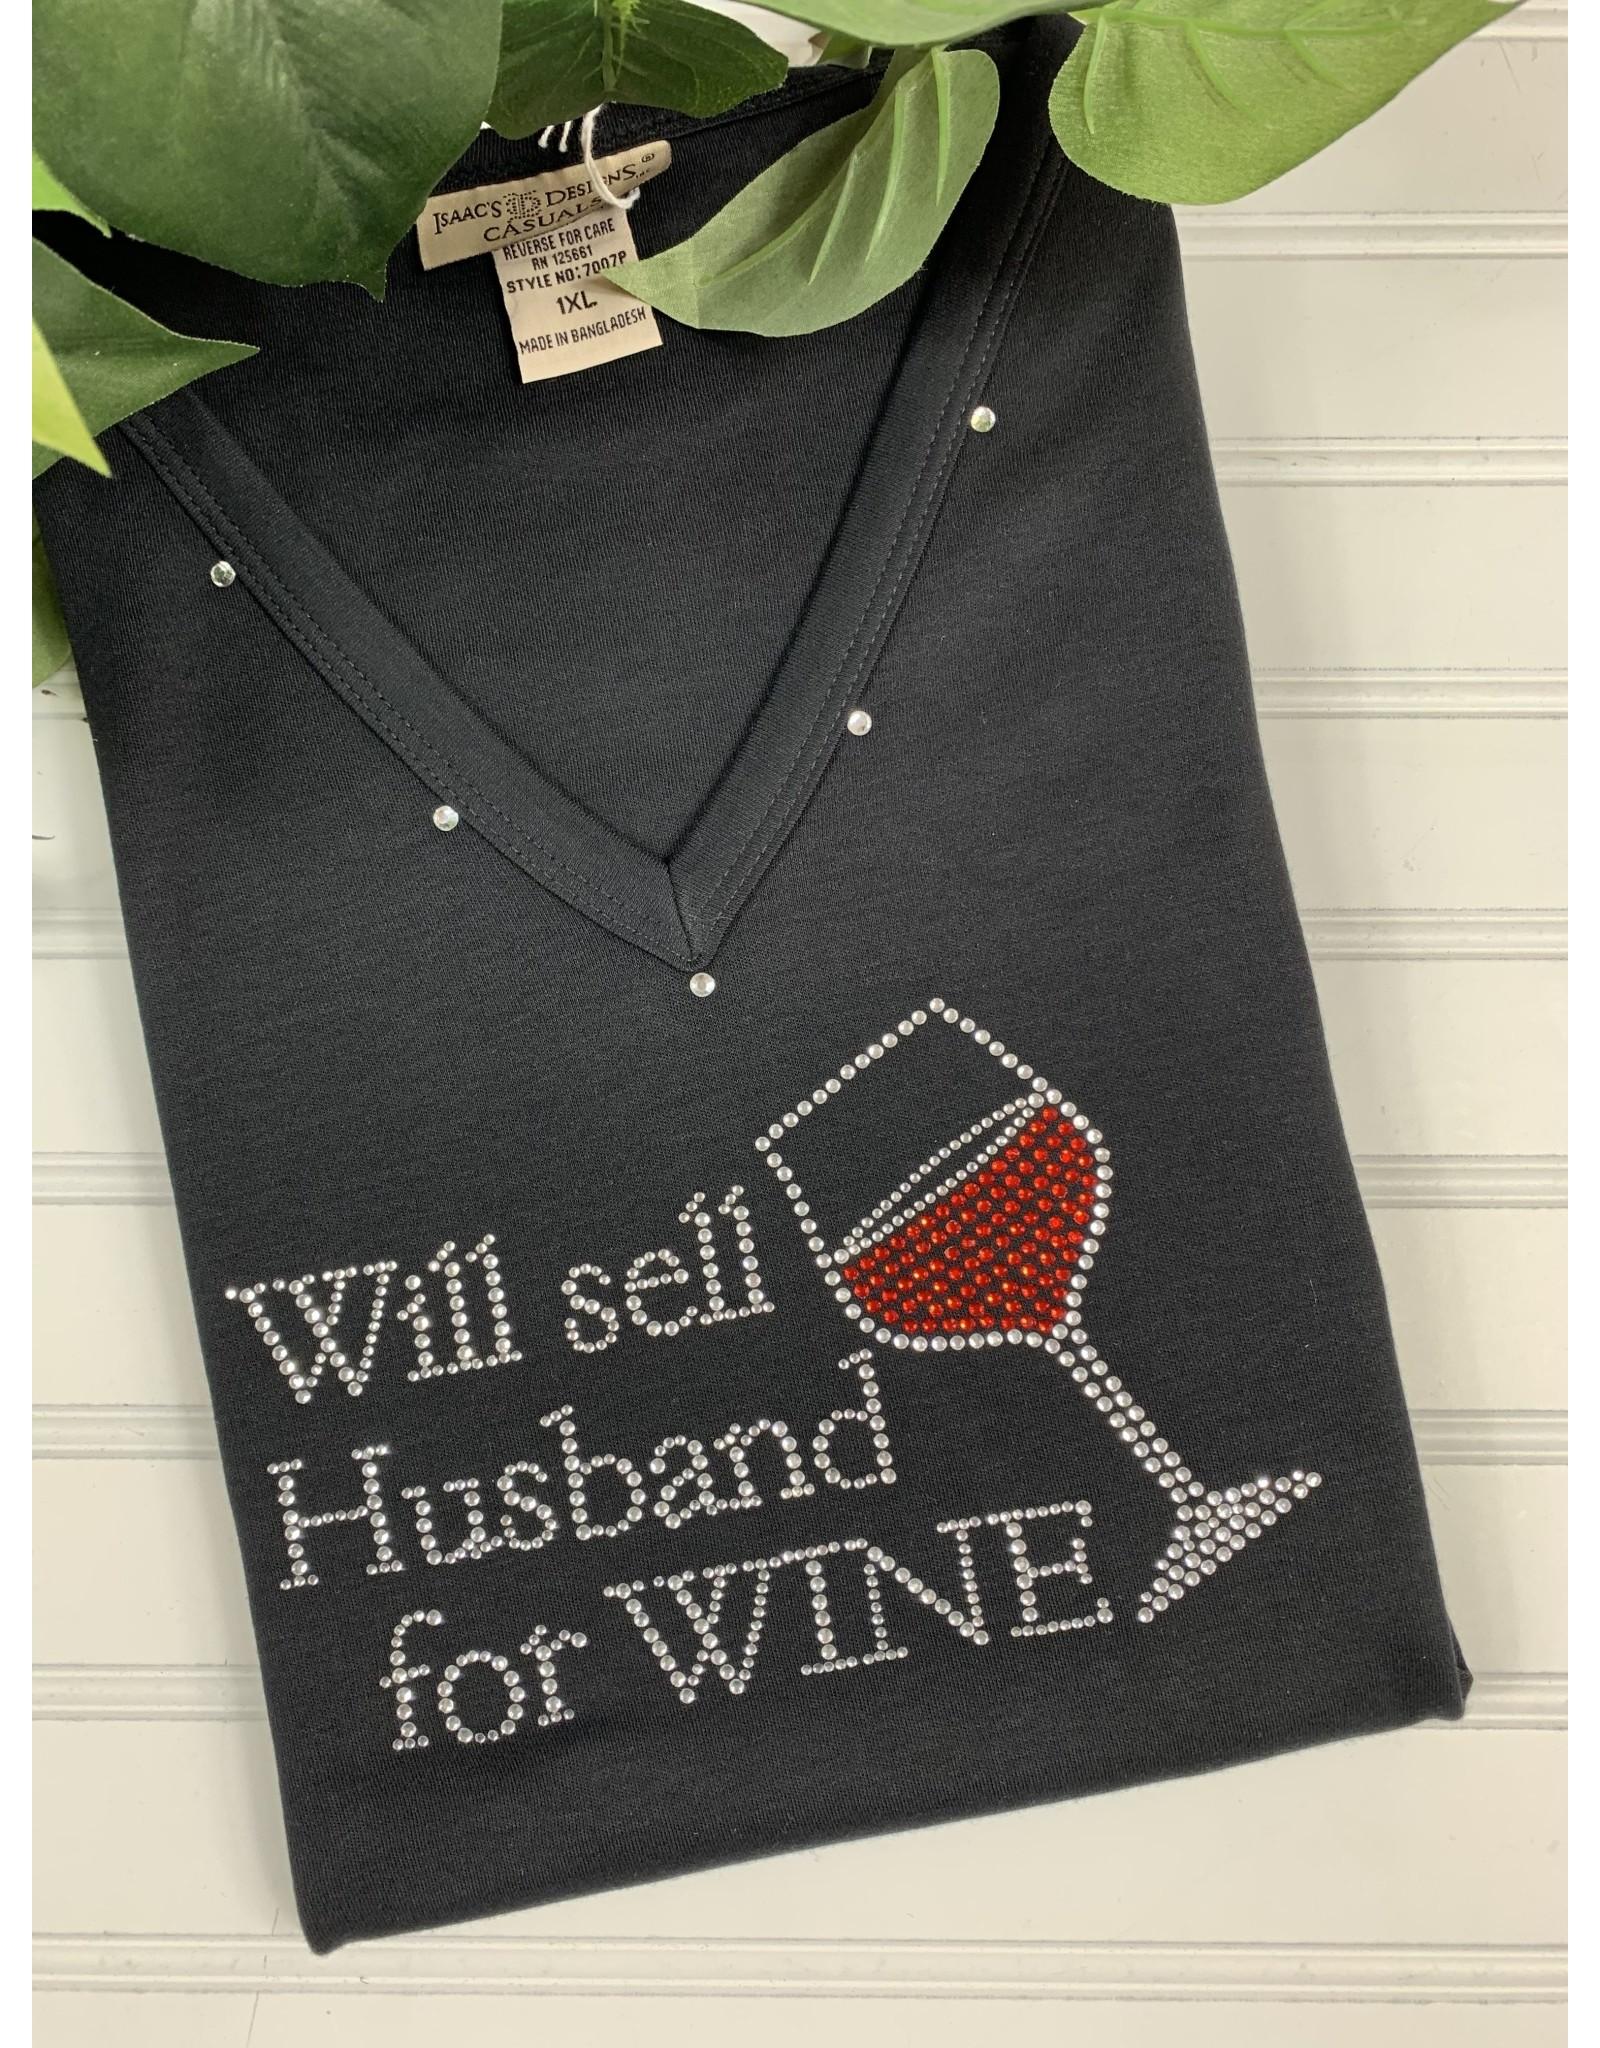 Isaac's Isaac's Will Sell Husband Wine Tee